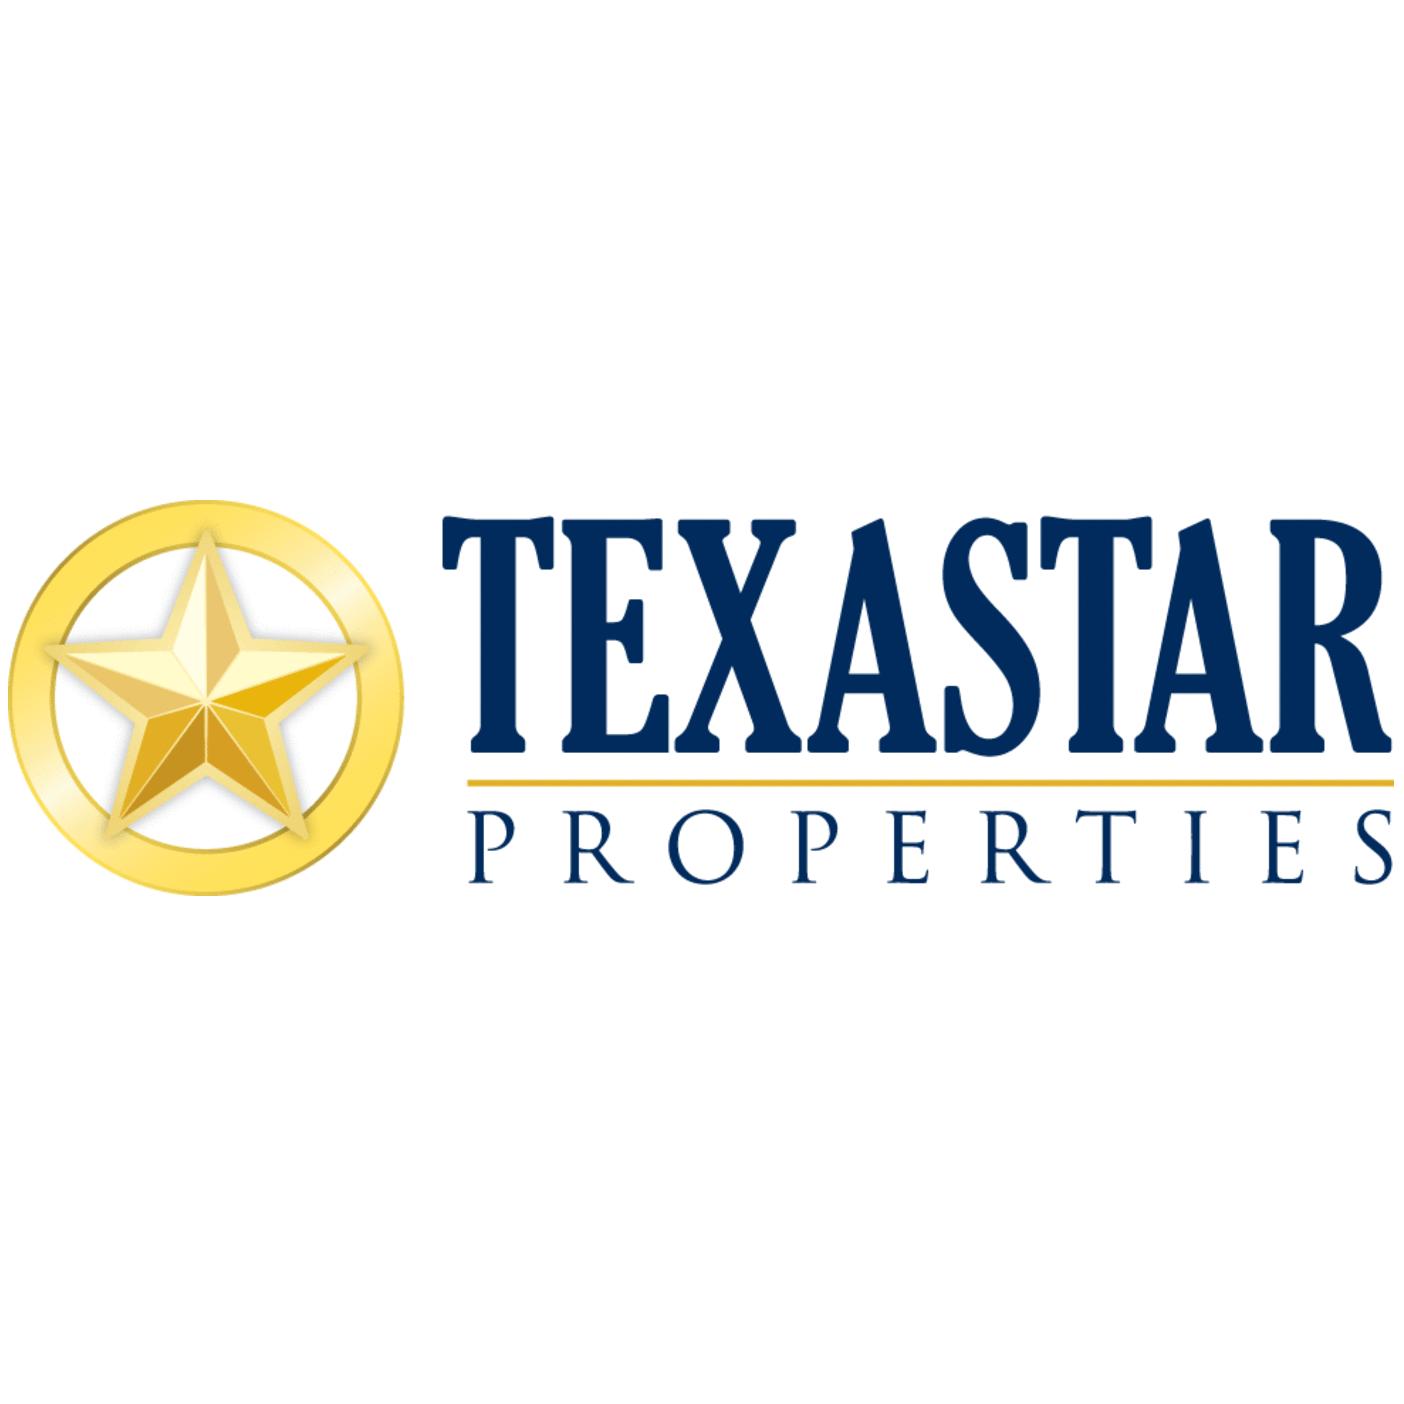 TexaStar Properties